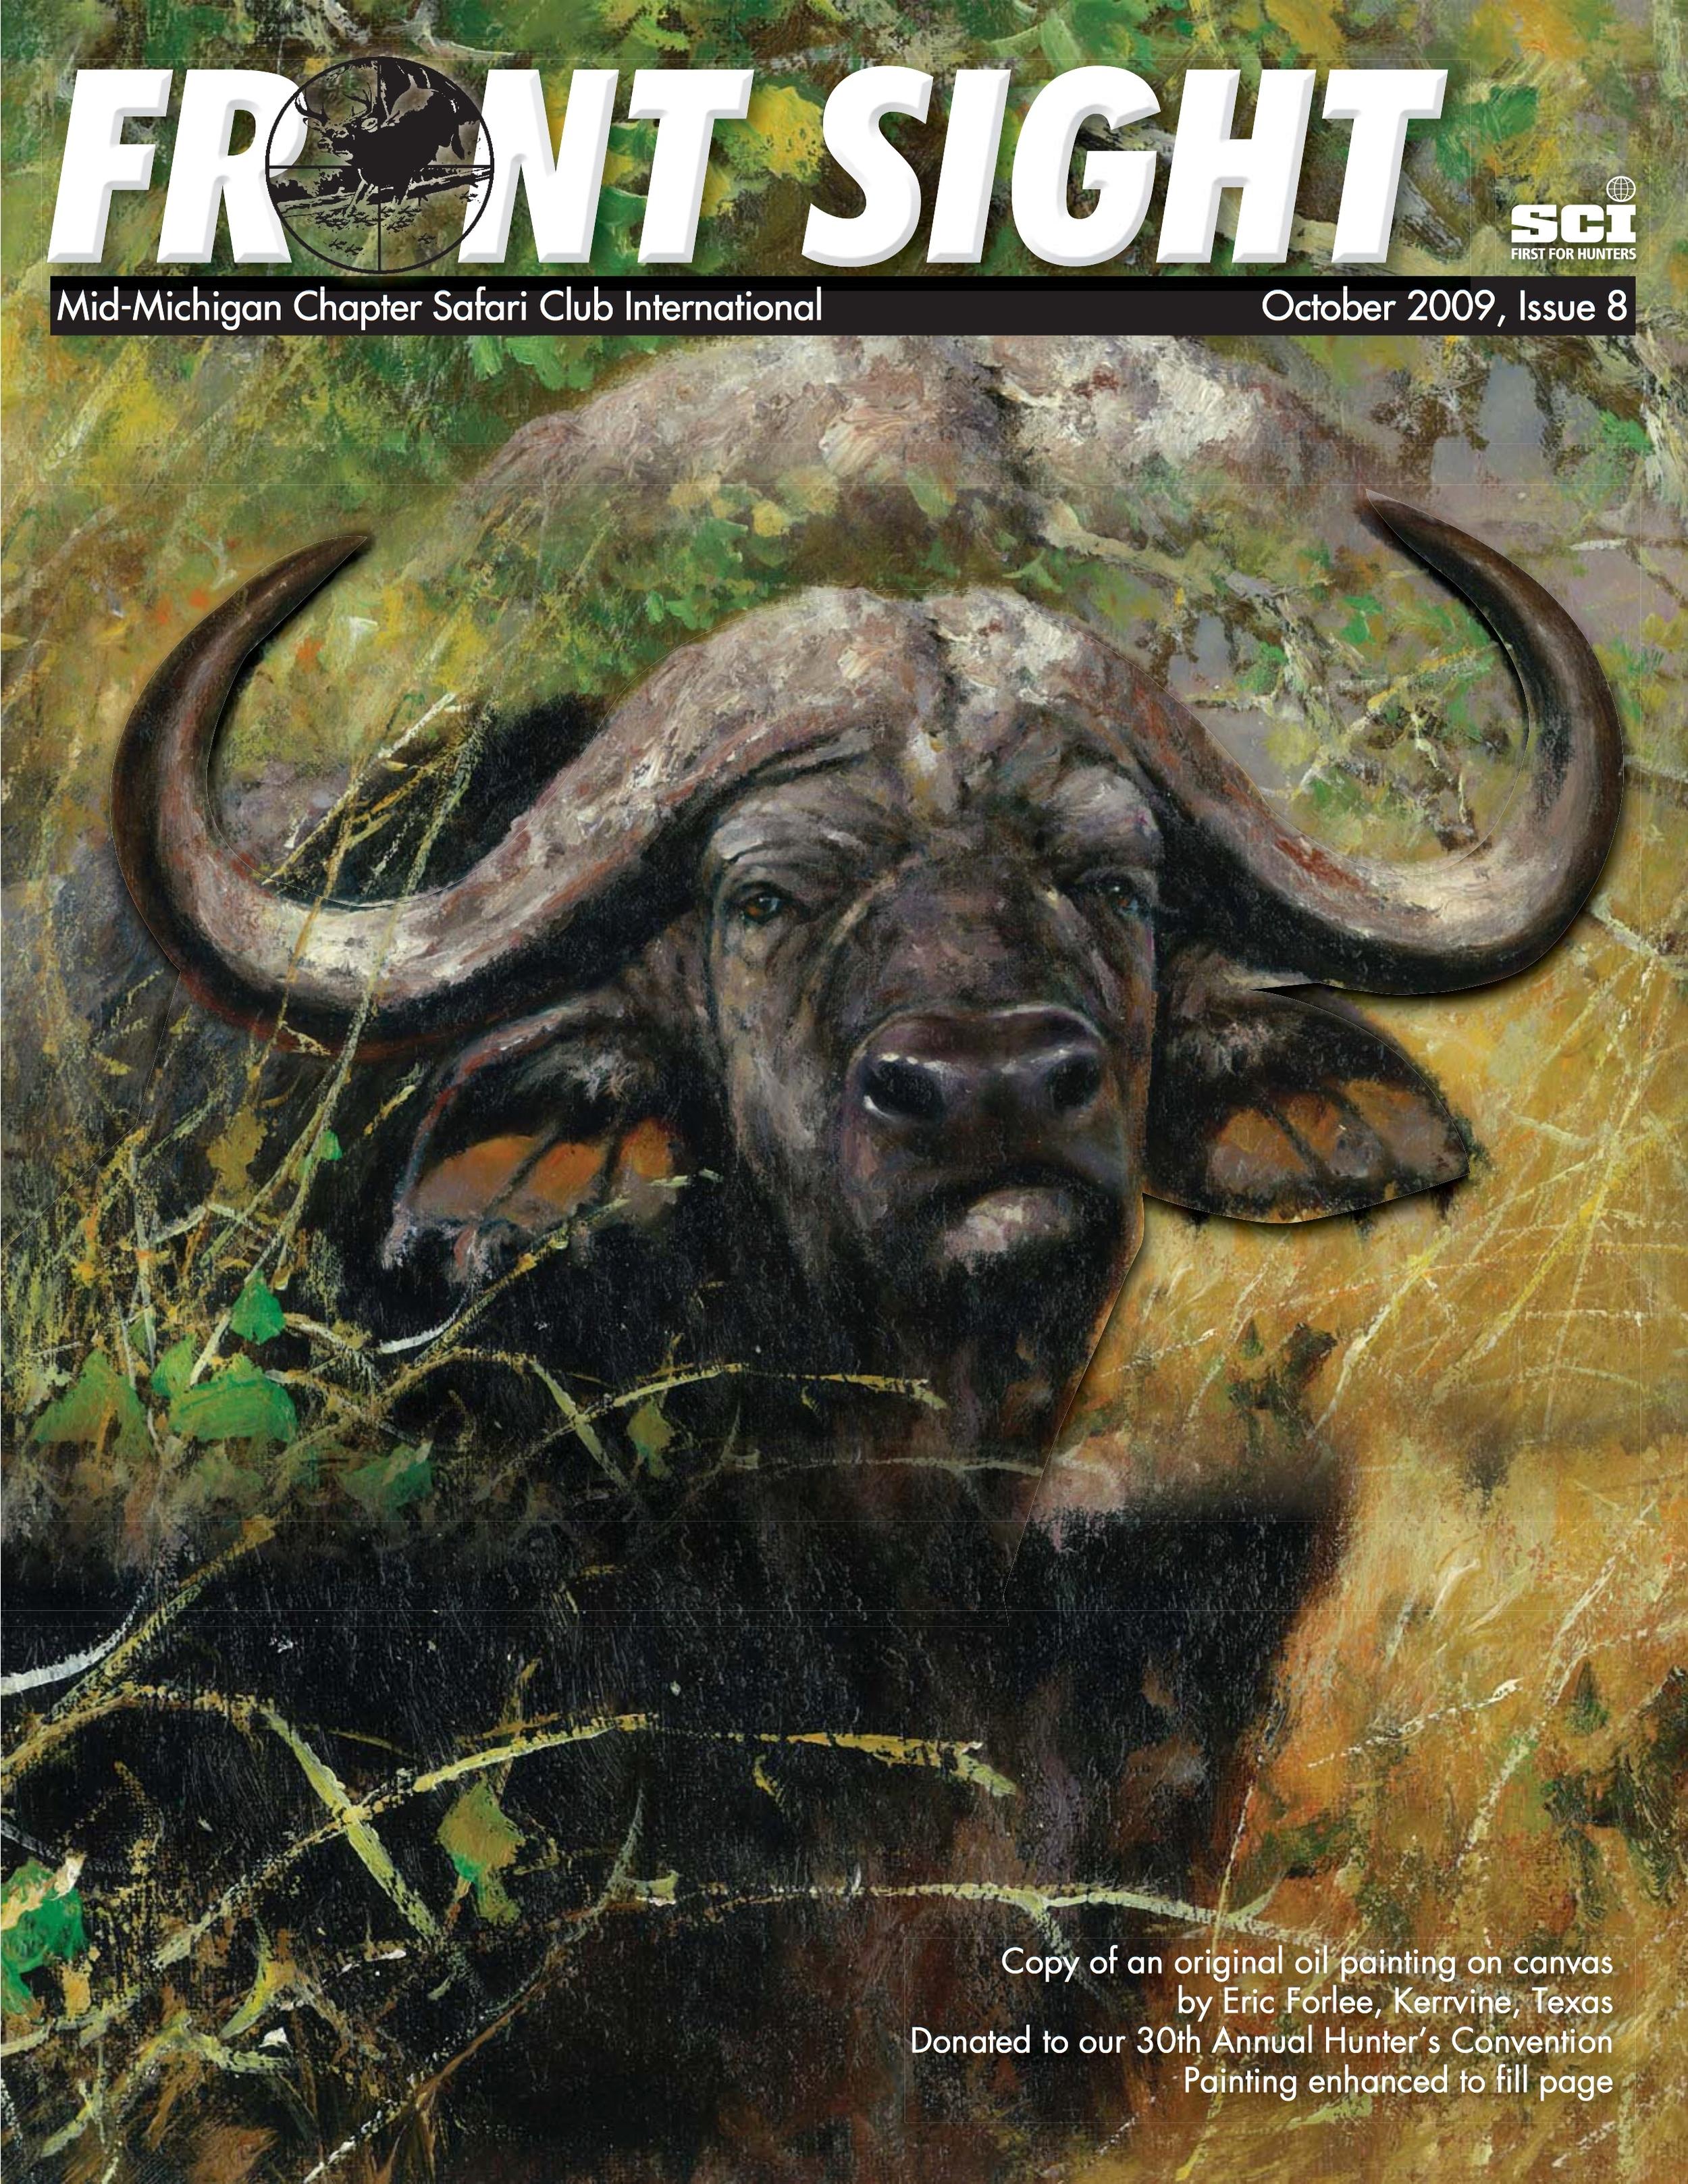 Issue 8, October 2009